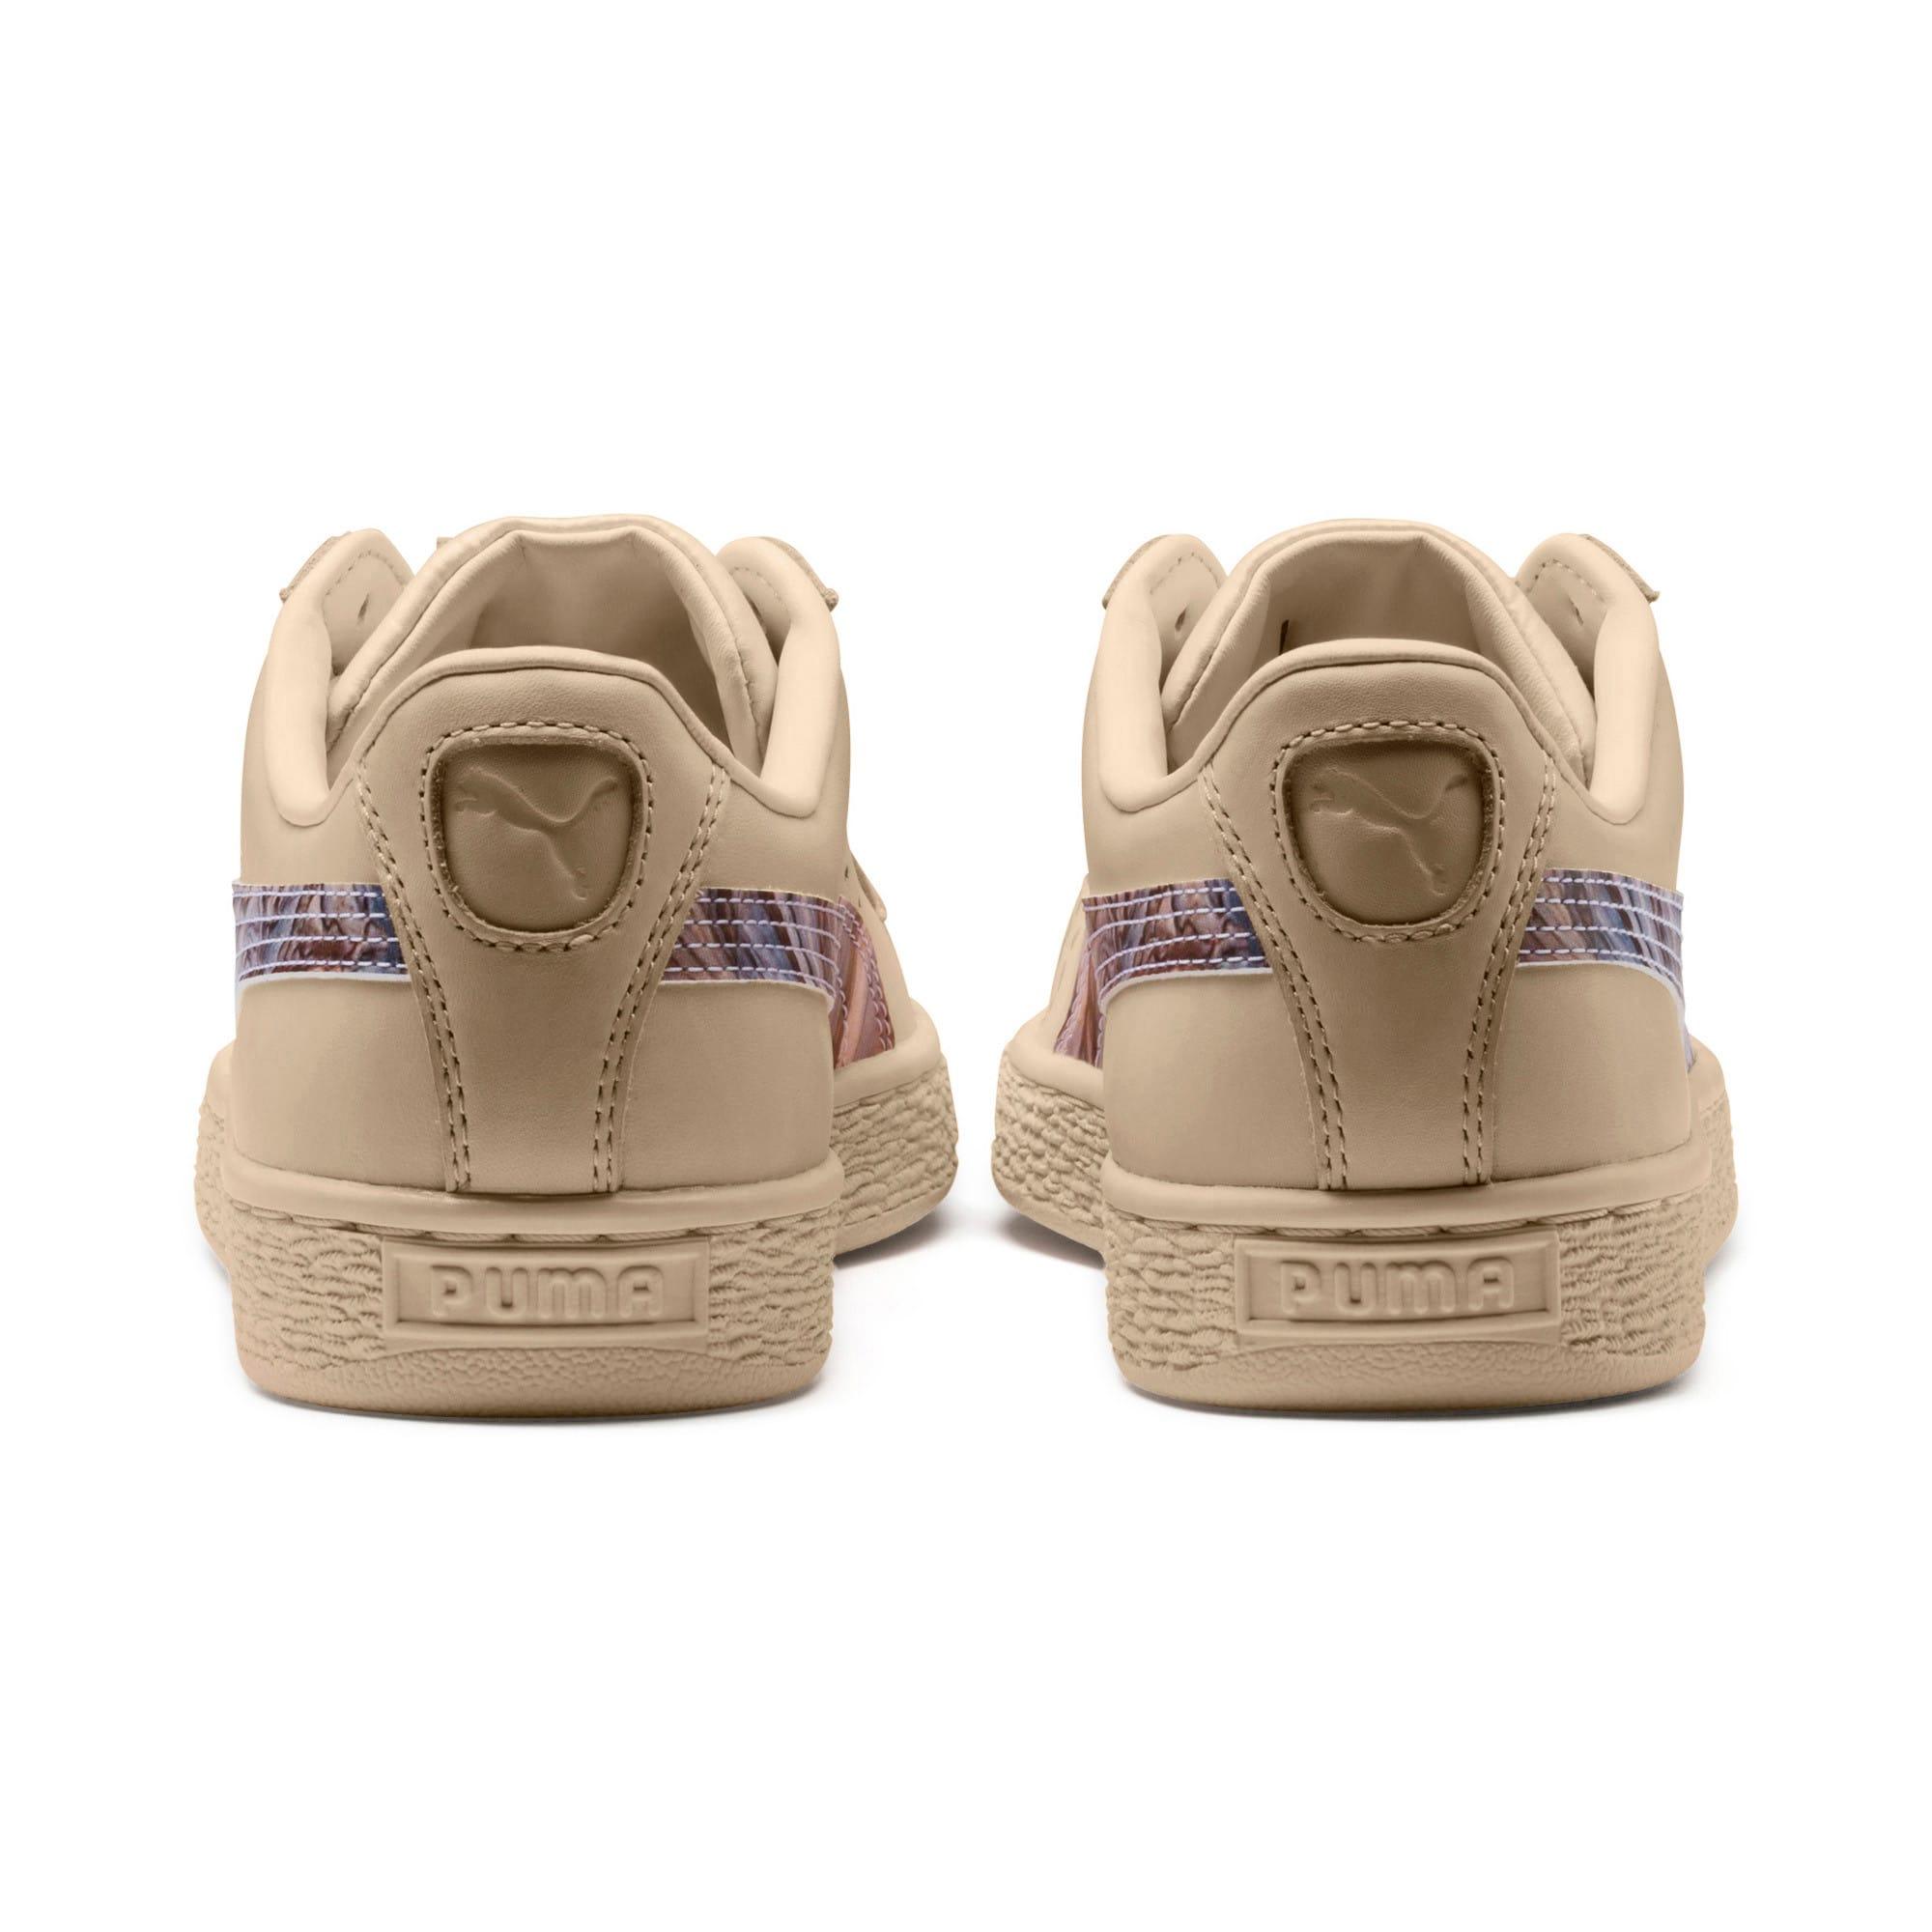 Thumbnail 4 of Basket Classic Mimicry Women's Sneakers, Vanilla Cream-Vanilla Cream, medium